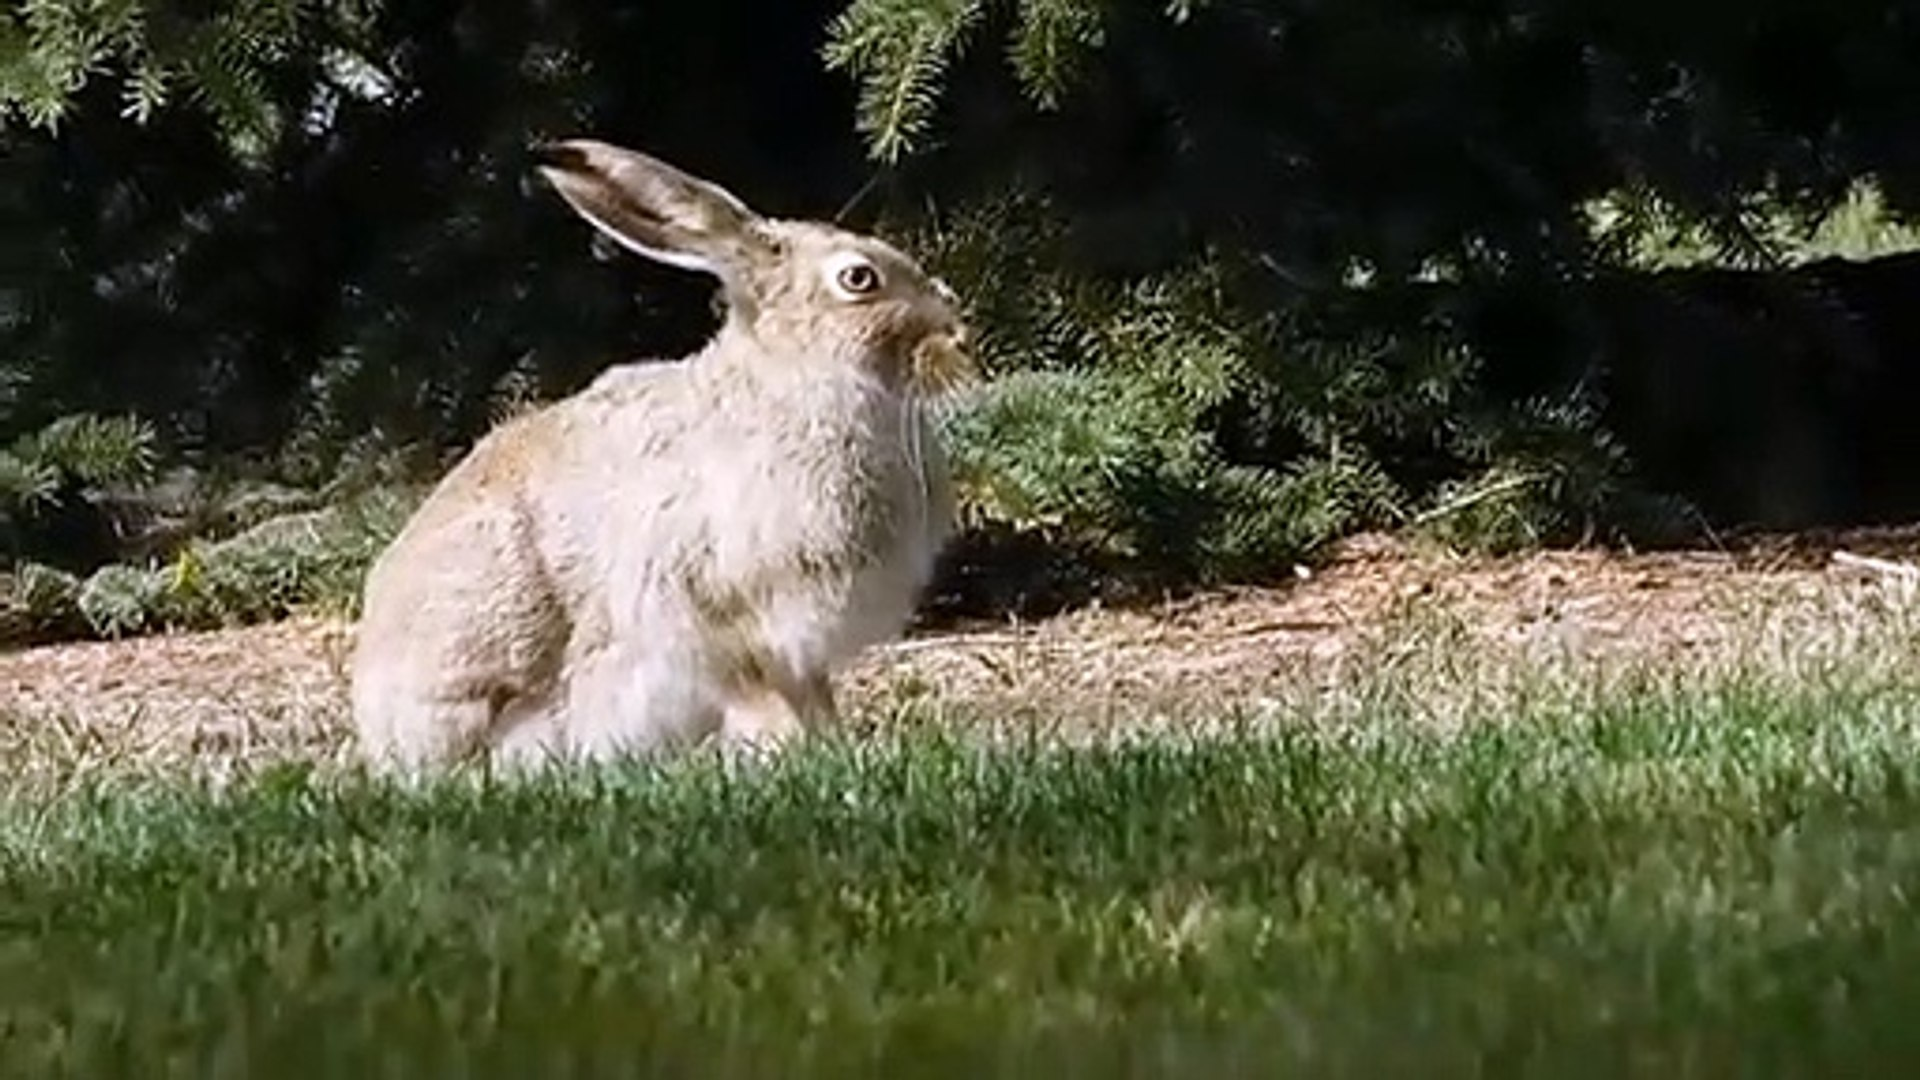 Cute Little Bunnies Playing Video